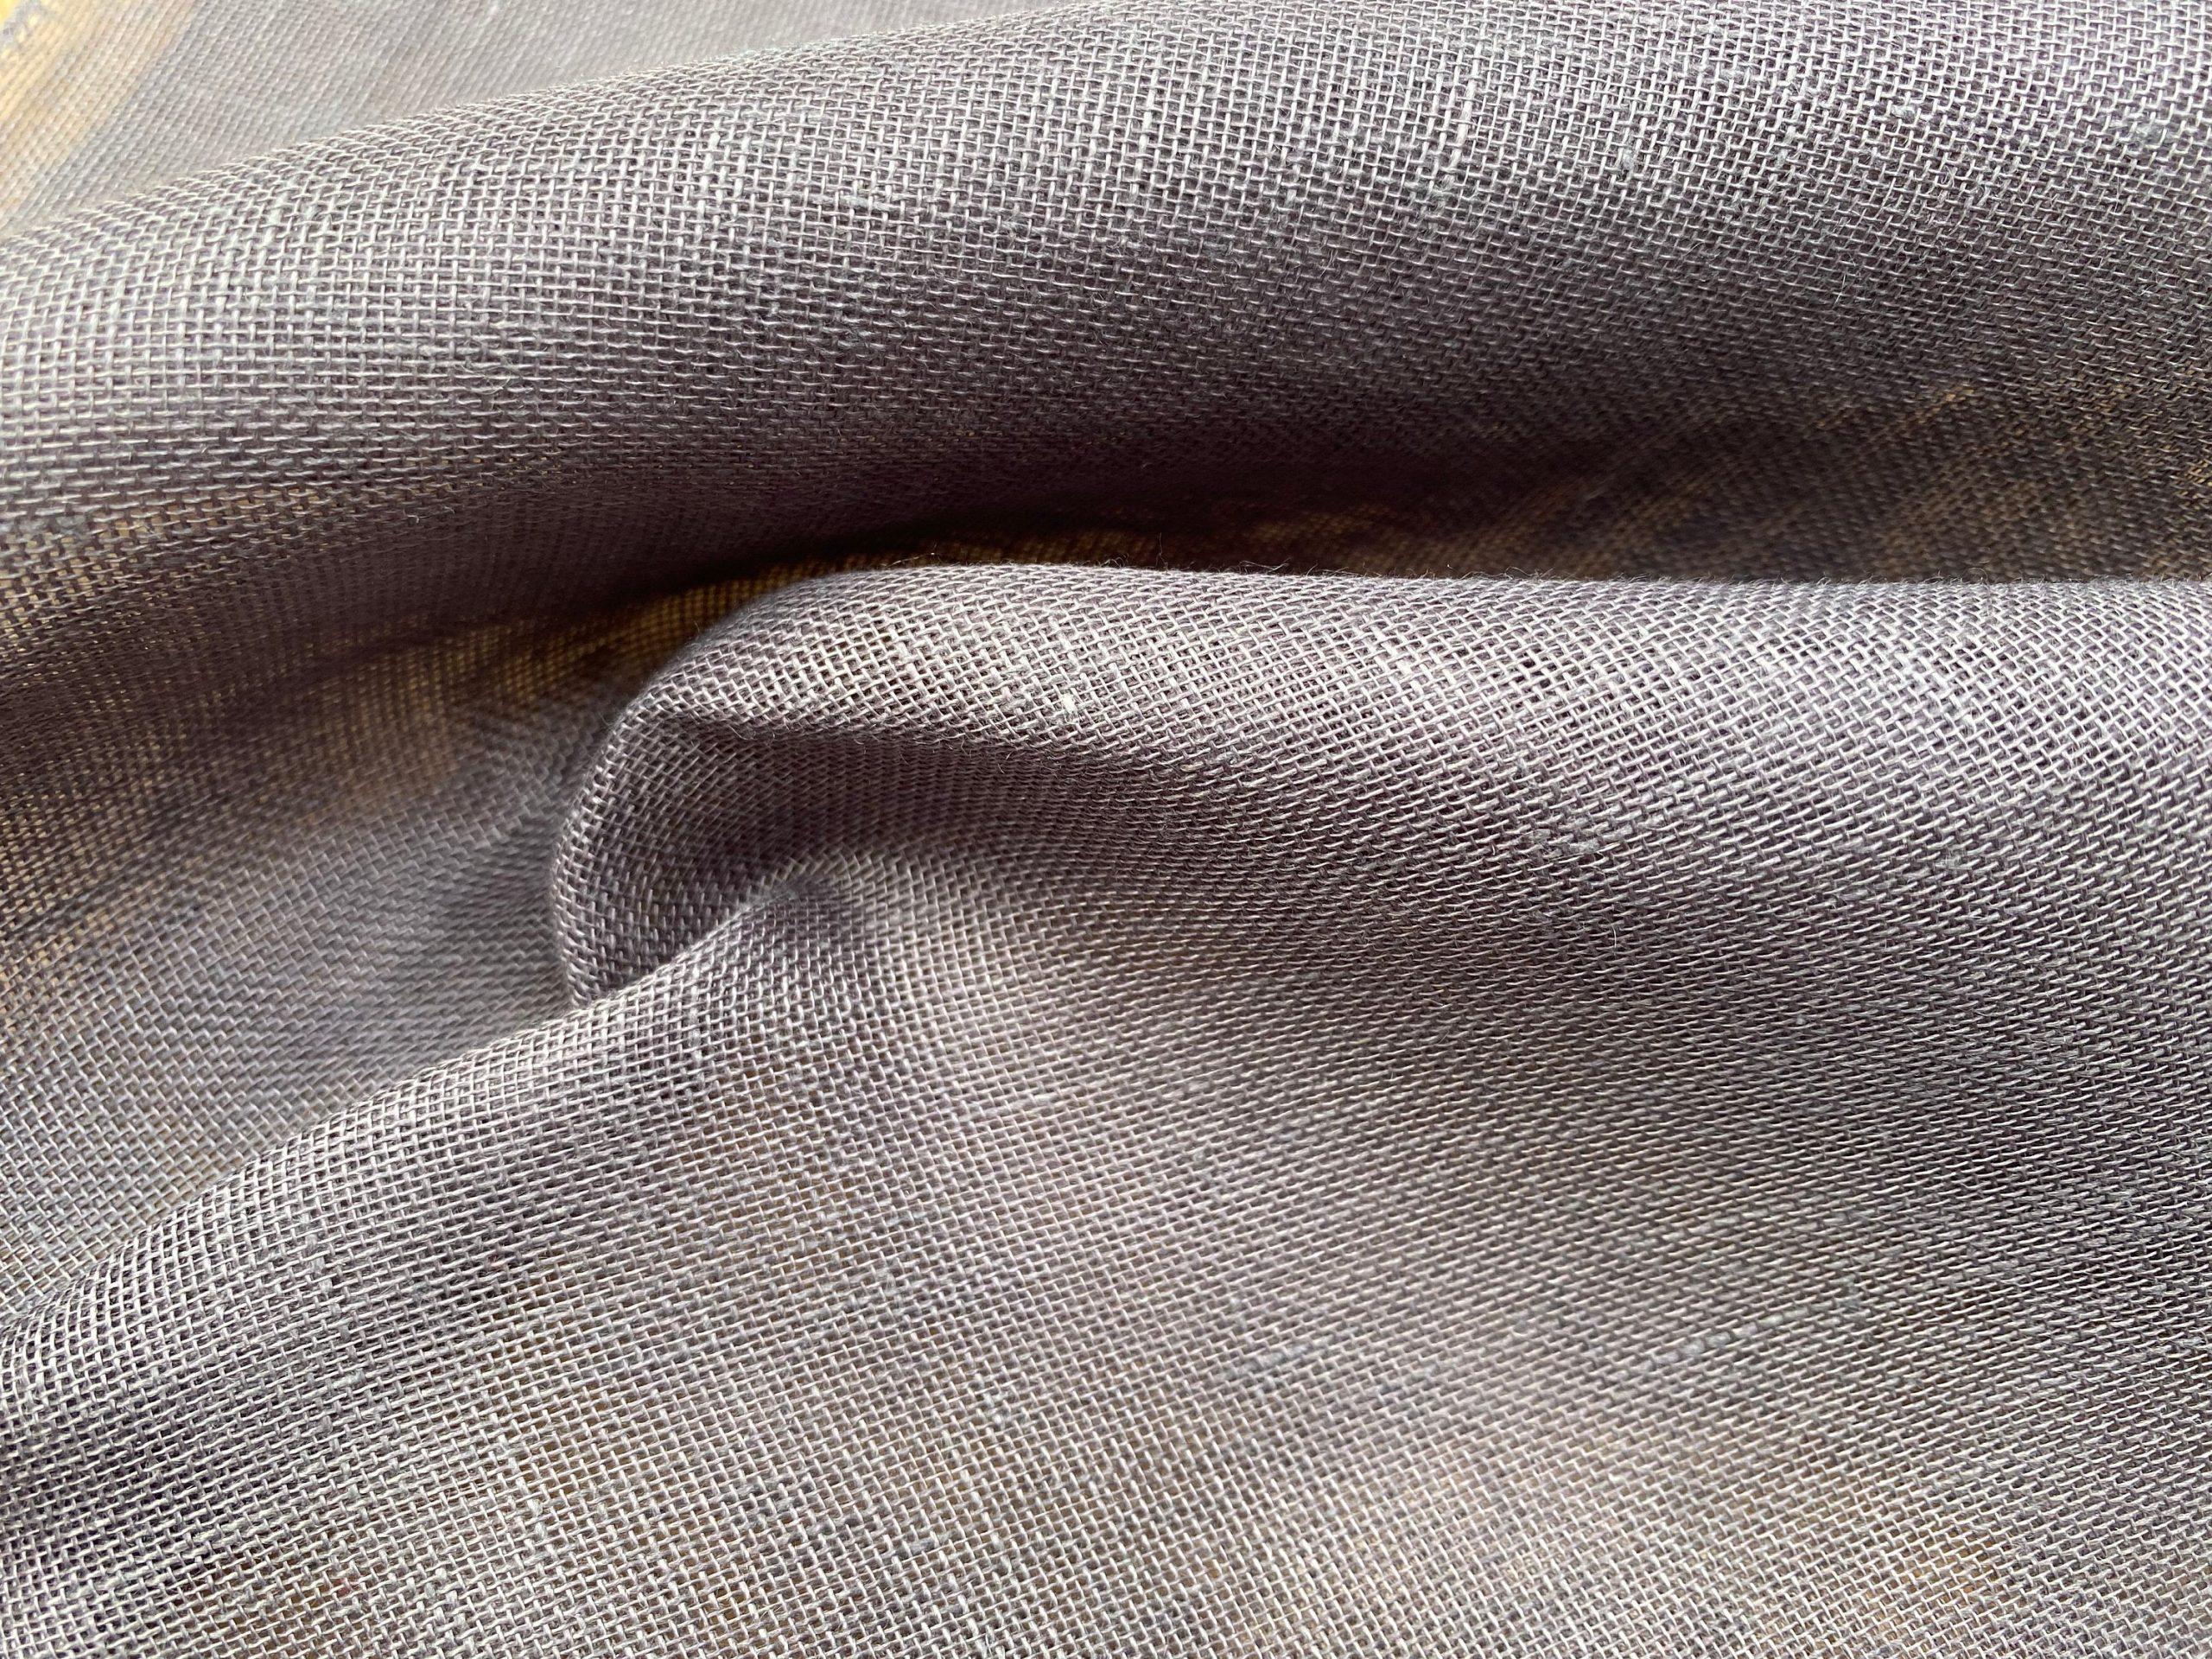 Extra Wide 100% Linen Fabric – Soft Linen Material for Home Decor, Curtains, Clothes – 118″/ 300cm wide – Plain GREY PLUM